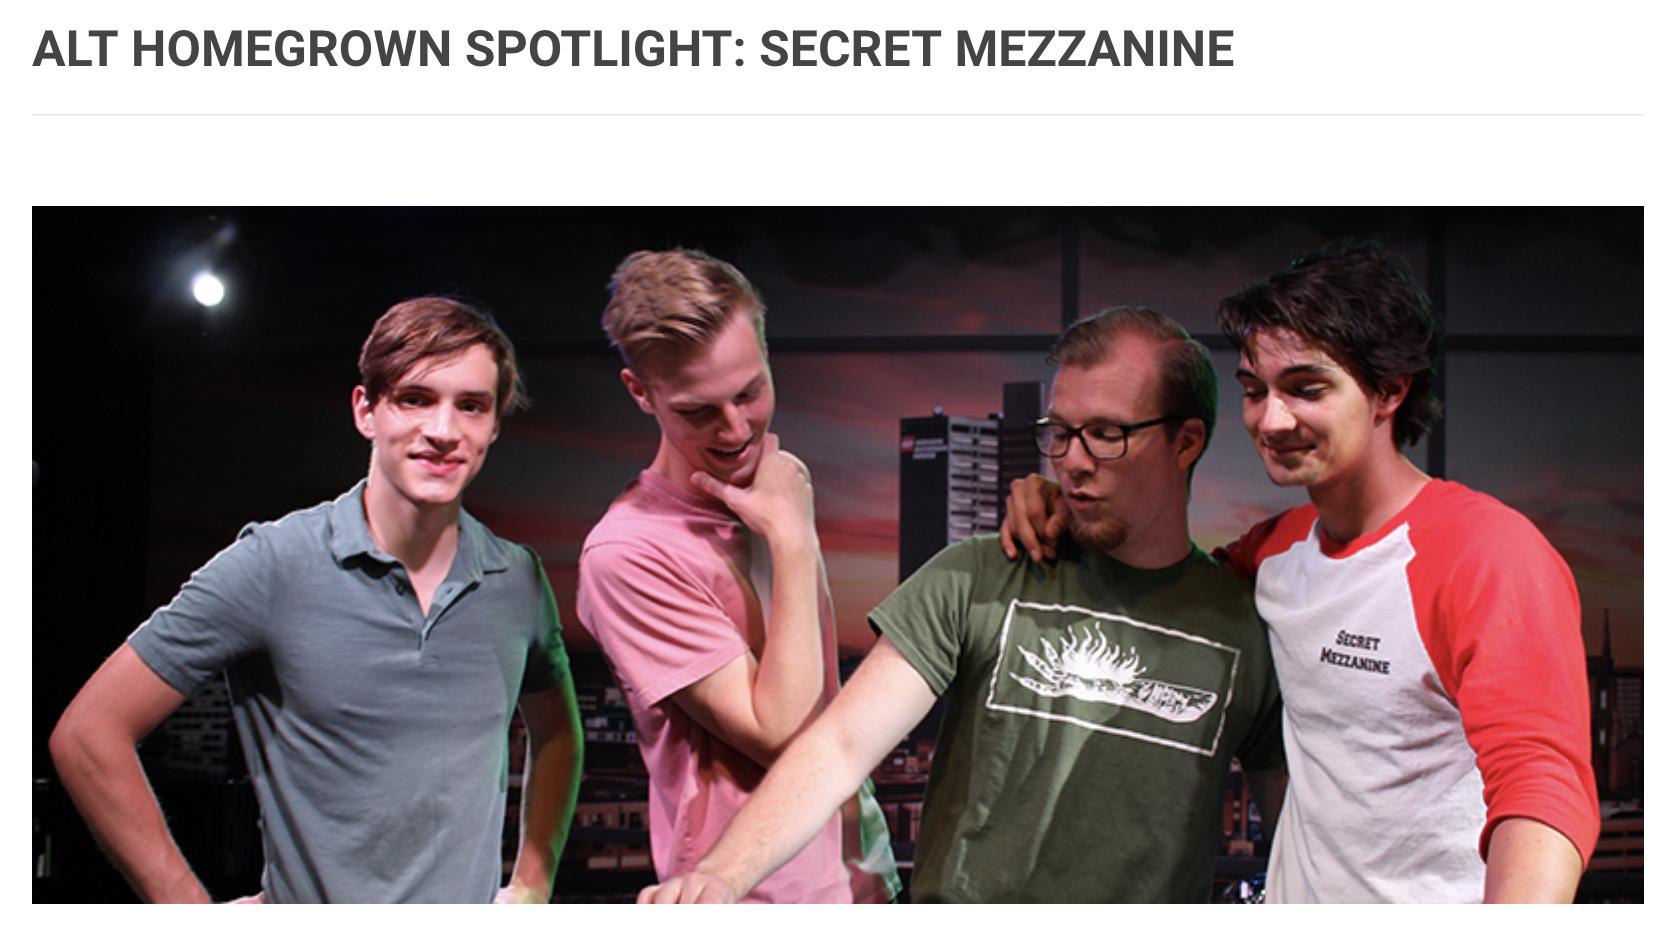 Alt 102.3 Homegrown Spotlight on Secret Mezzanine